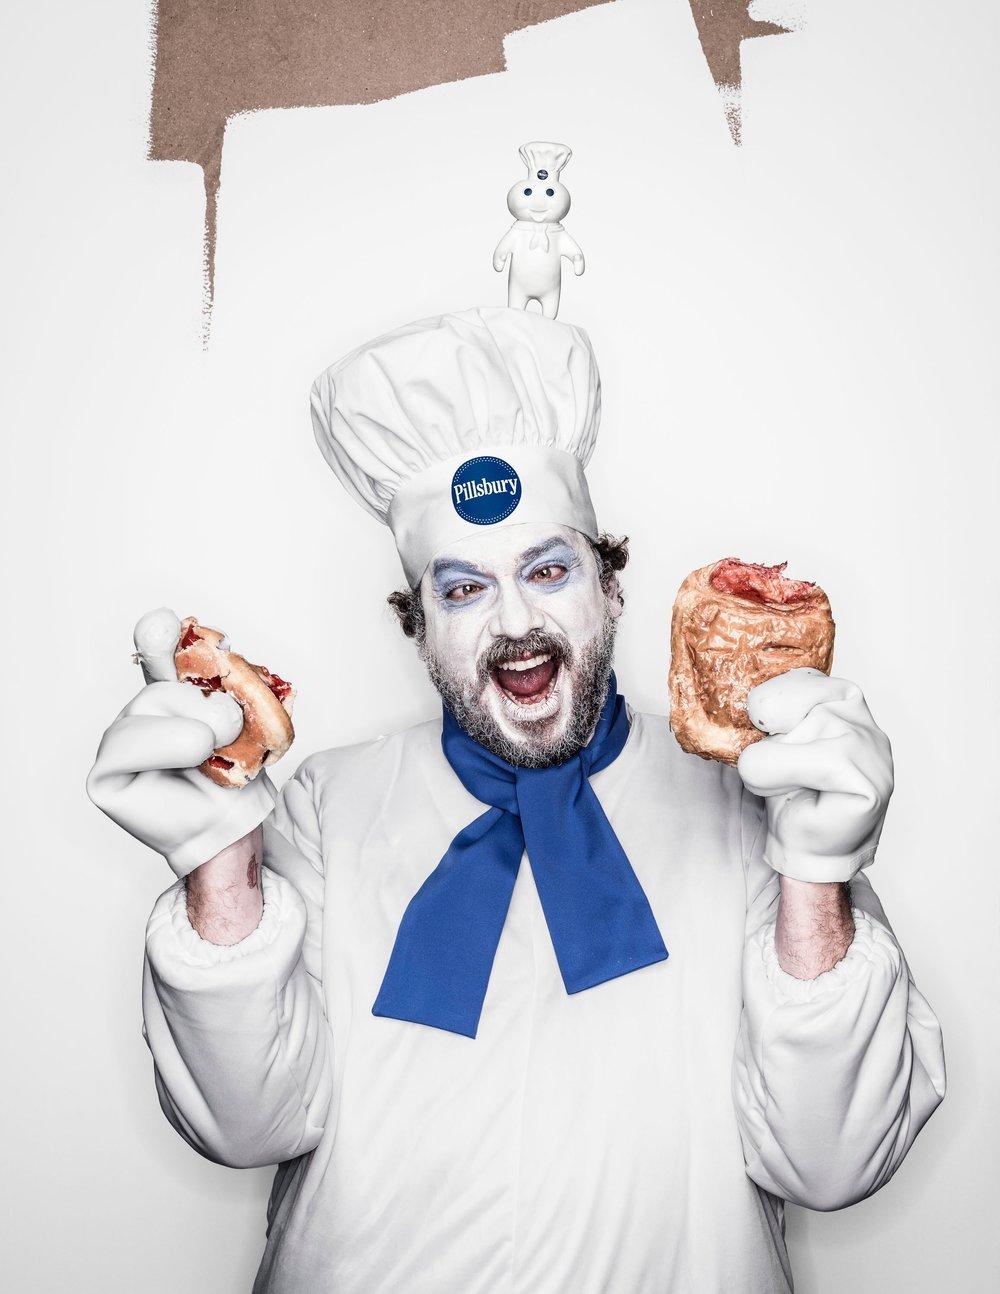 Danny McBride for GQ  Photo: Dan Winters